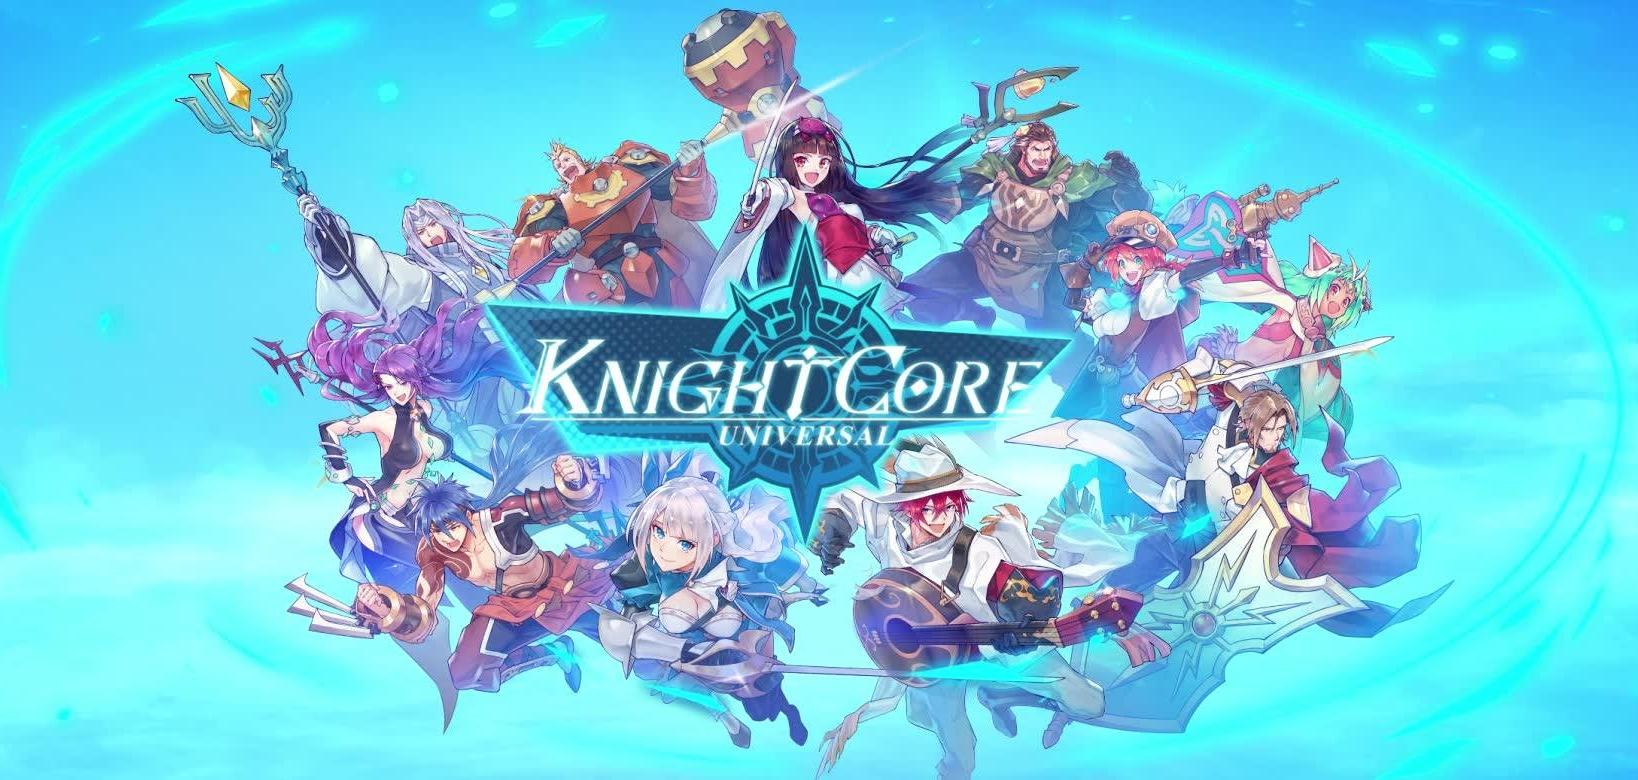 Knight Core Universe 1612021 1